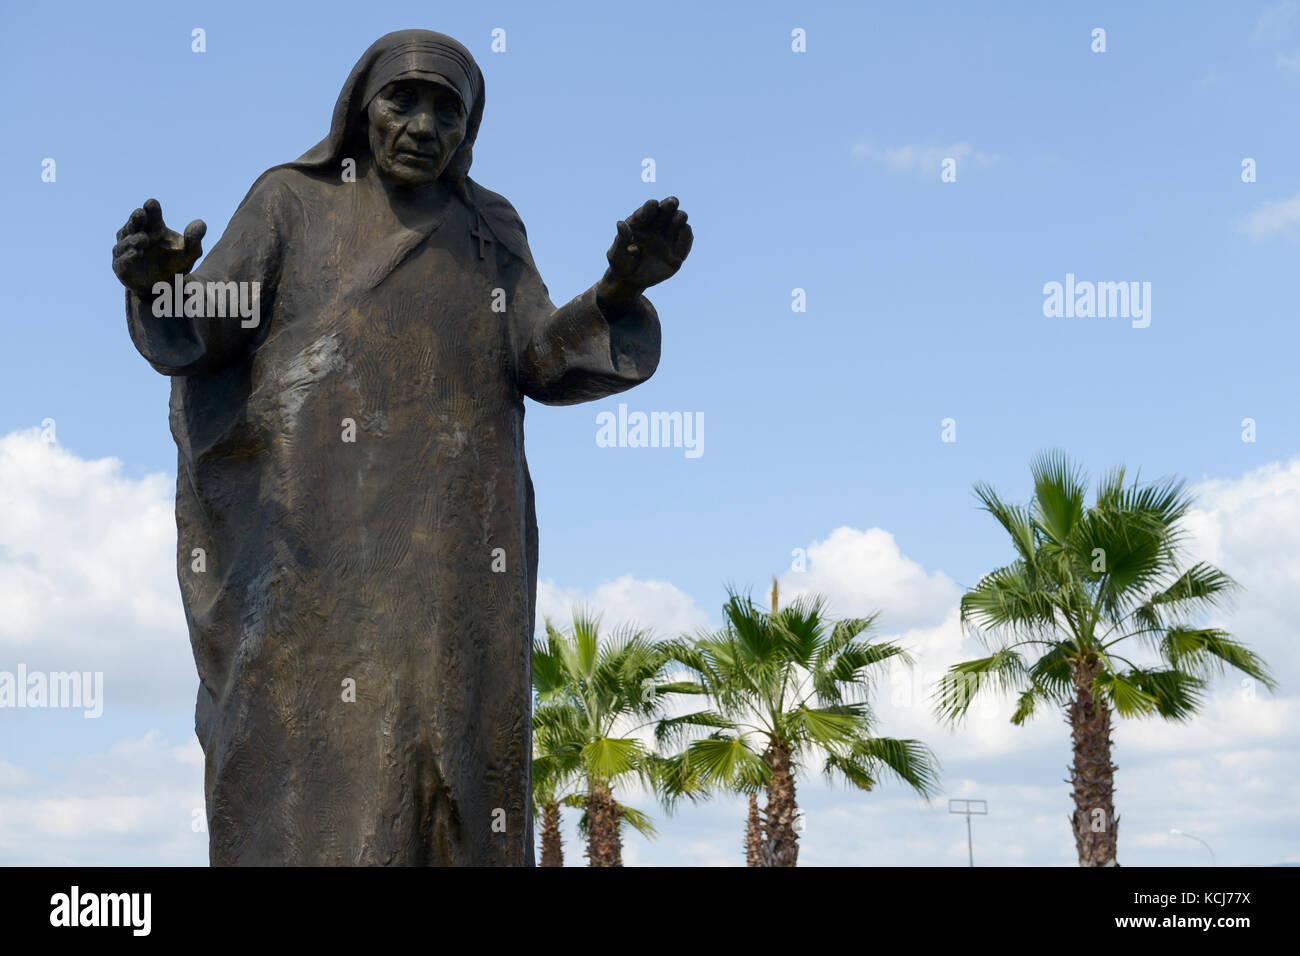 ALBANIA, Tirana , Mother Teresa memorial at airport, she was born as Anjezë Gonxha Bojaxhiu on 26. August 1910 - Stock Image